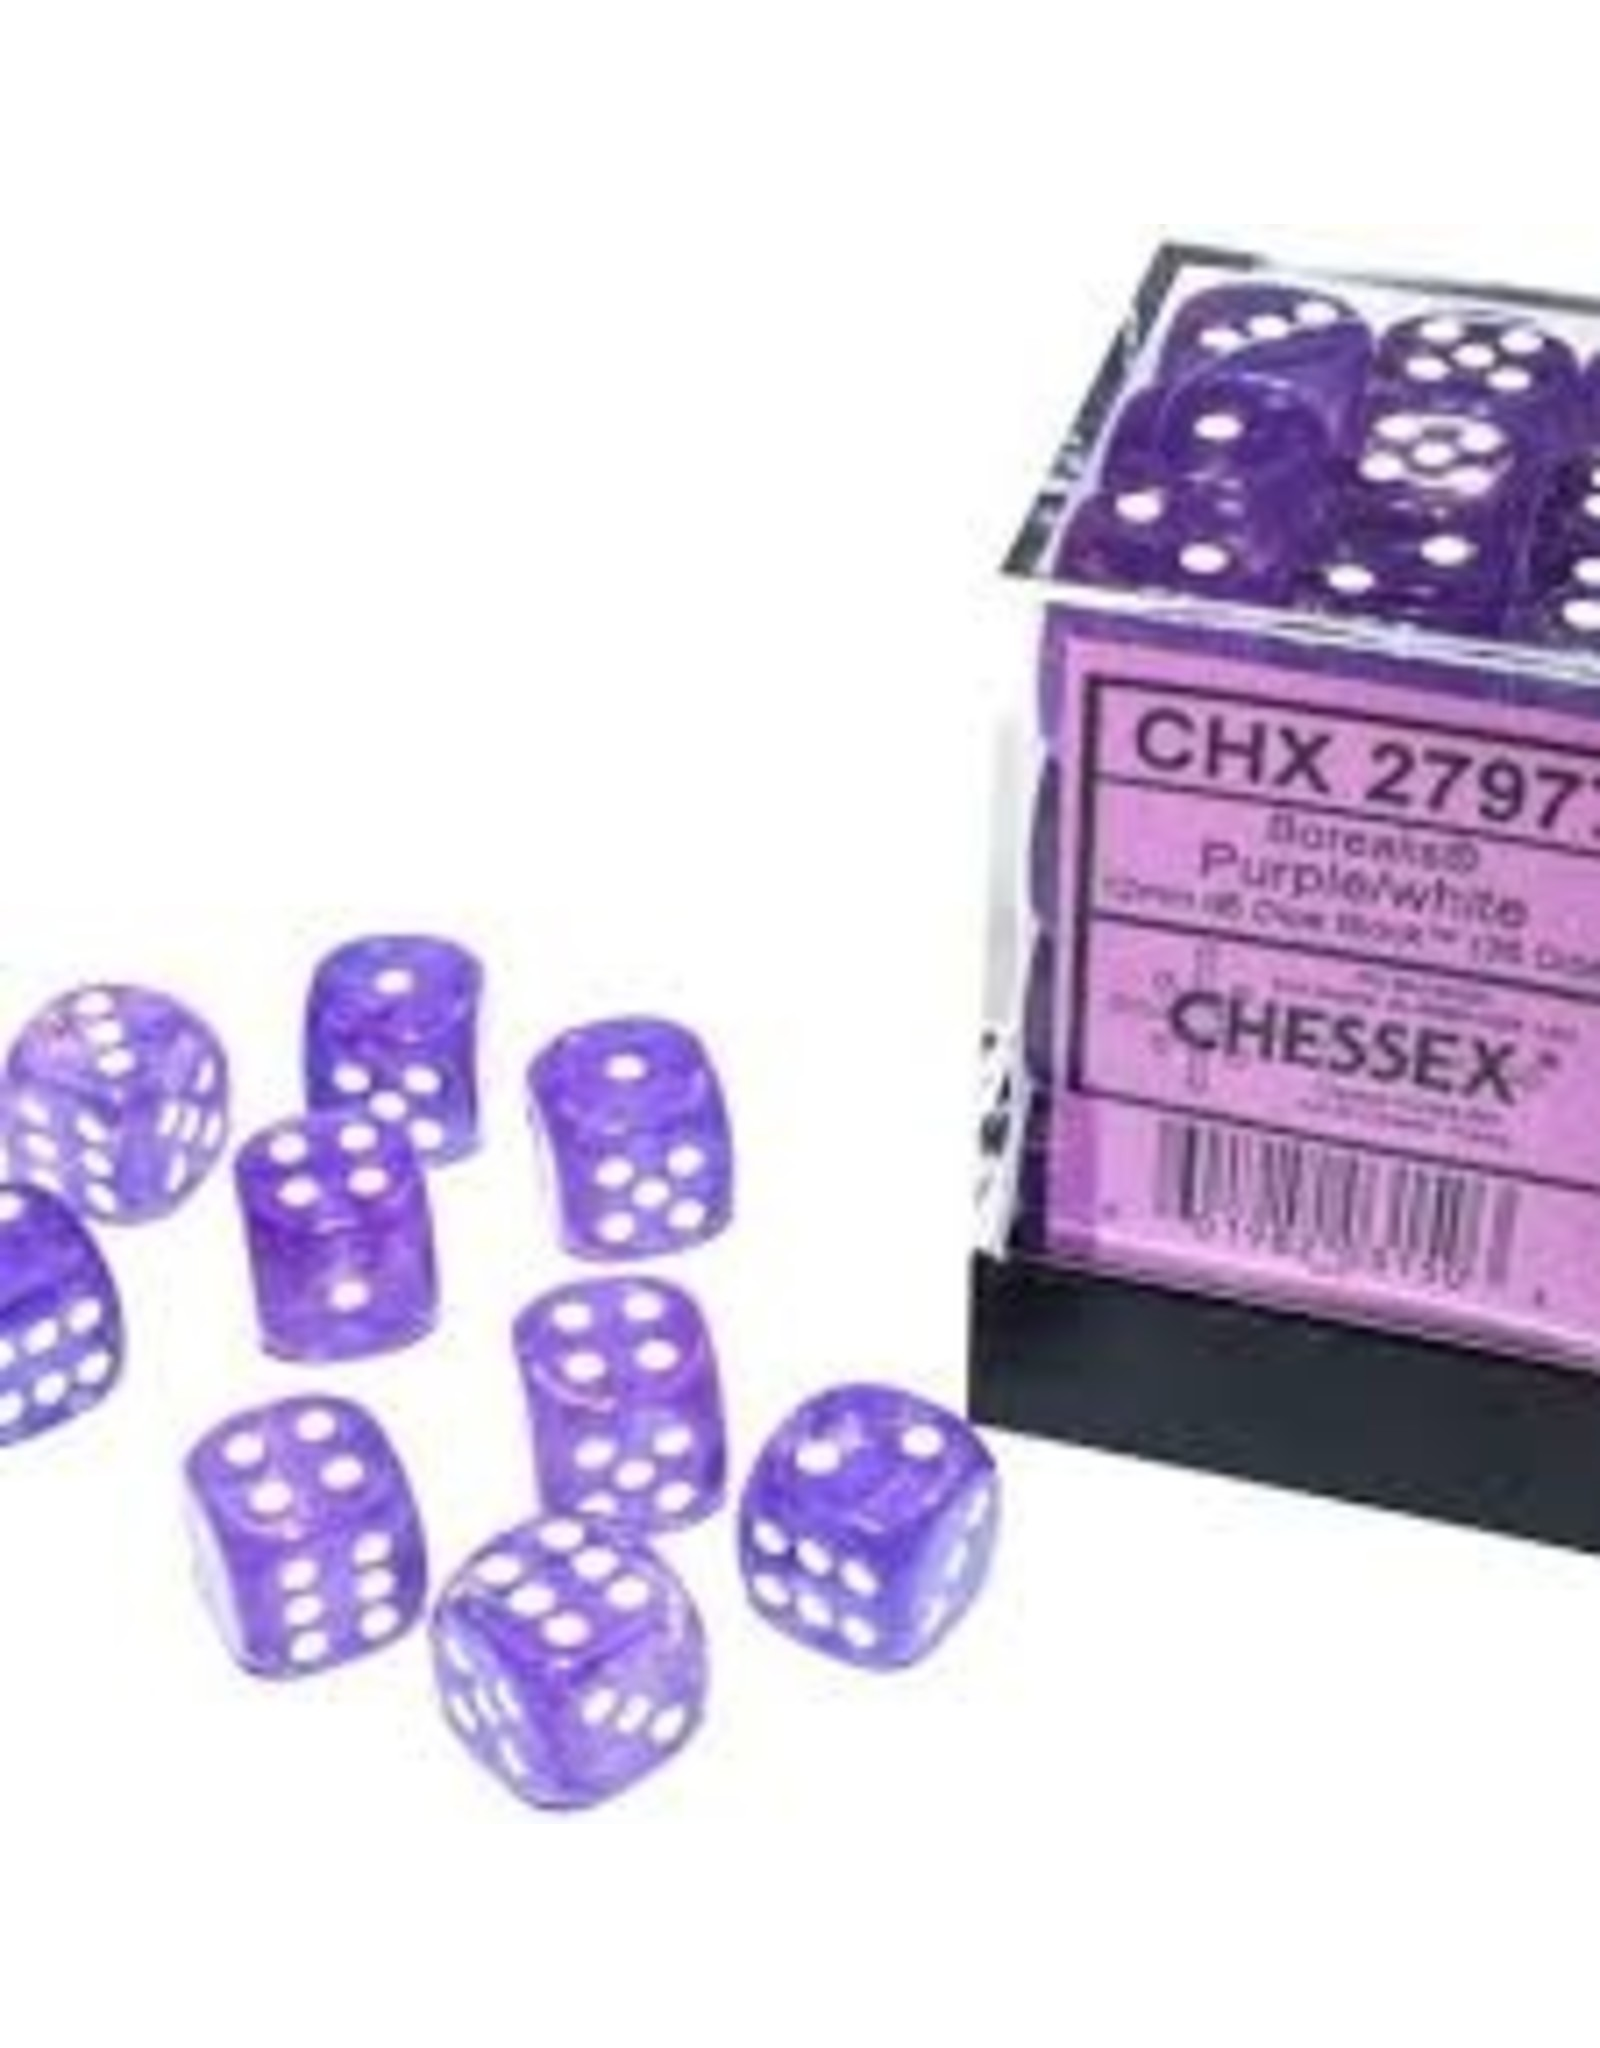 Chessex d6Cube12mm Borealis Luminary PUwh (36)